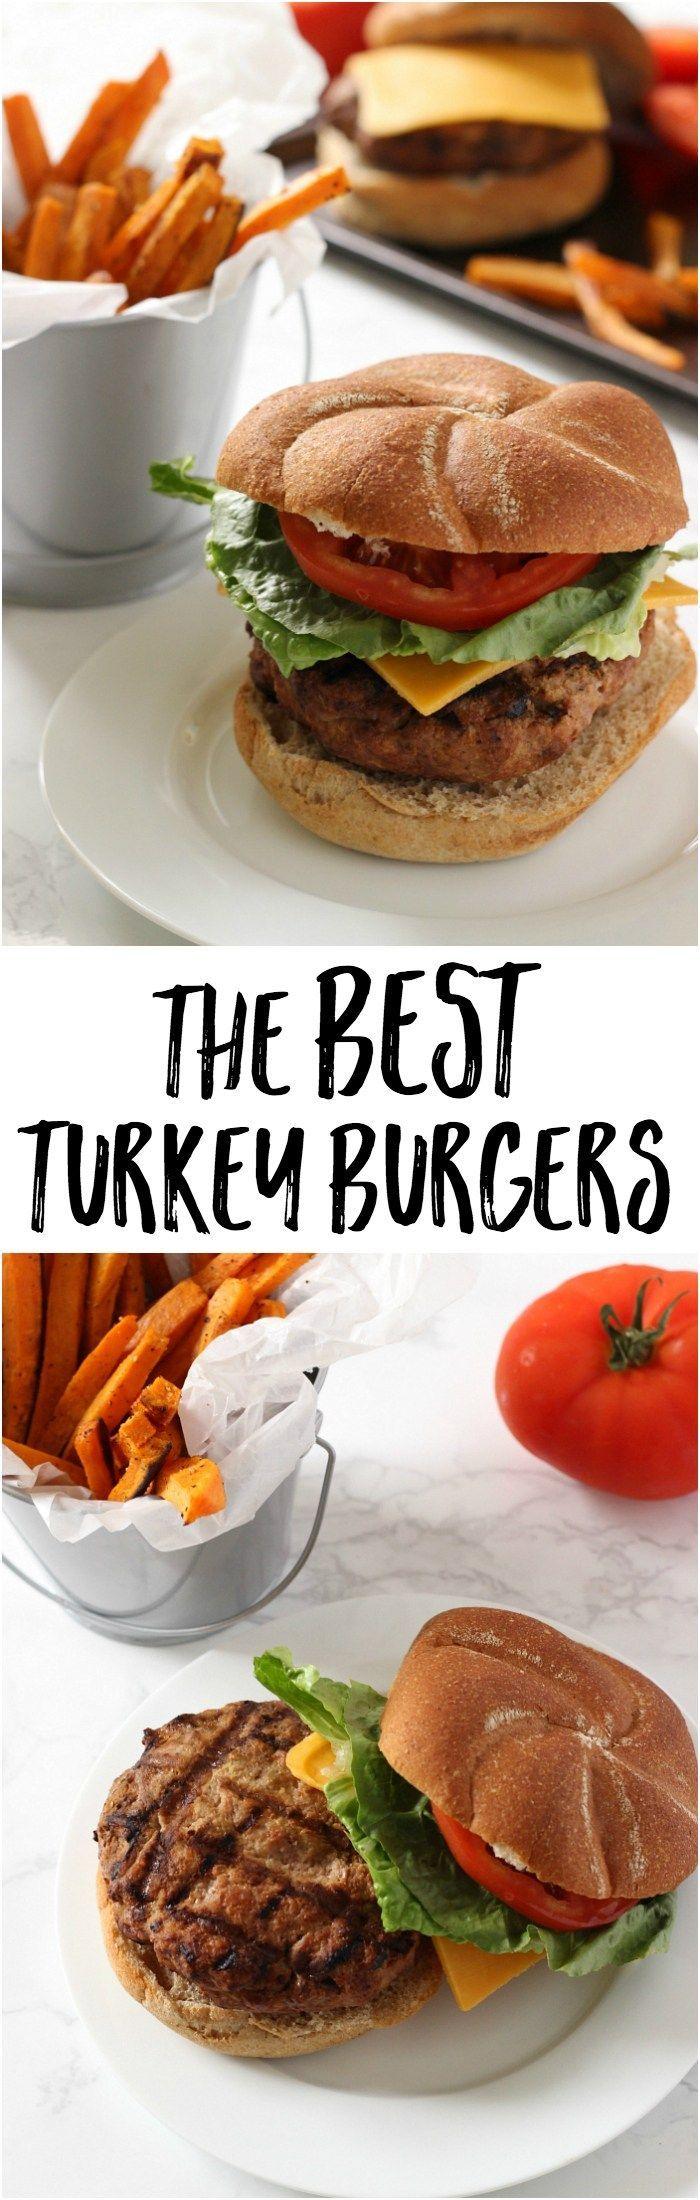 The Best Turkey Burger on Pinterest